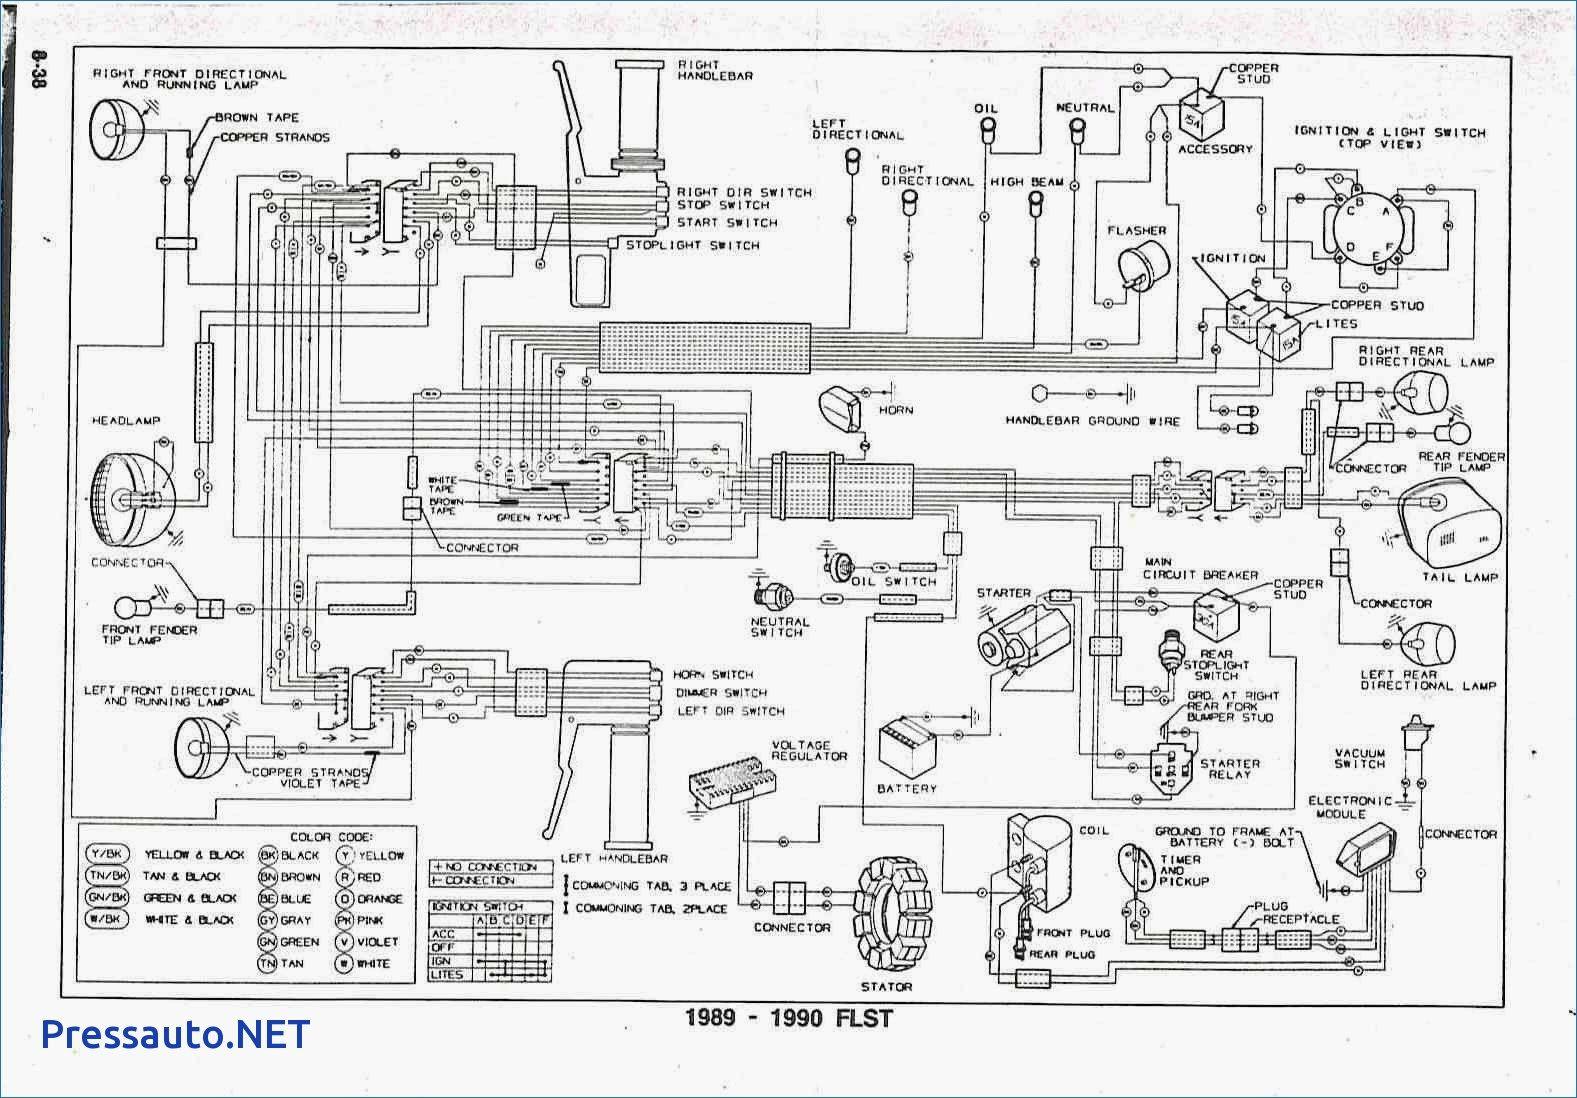 Wiring Diagram Harley Davidson Download Free Printable Of For